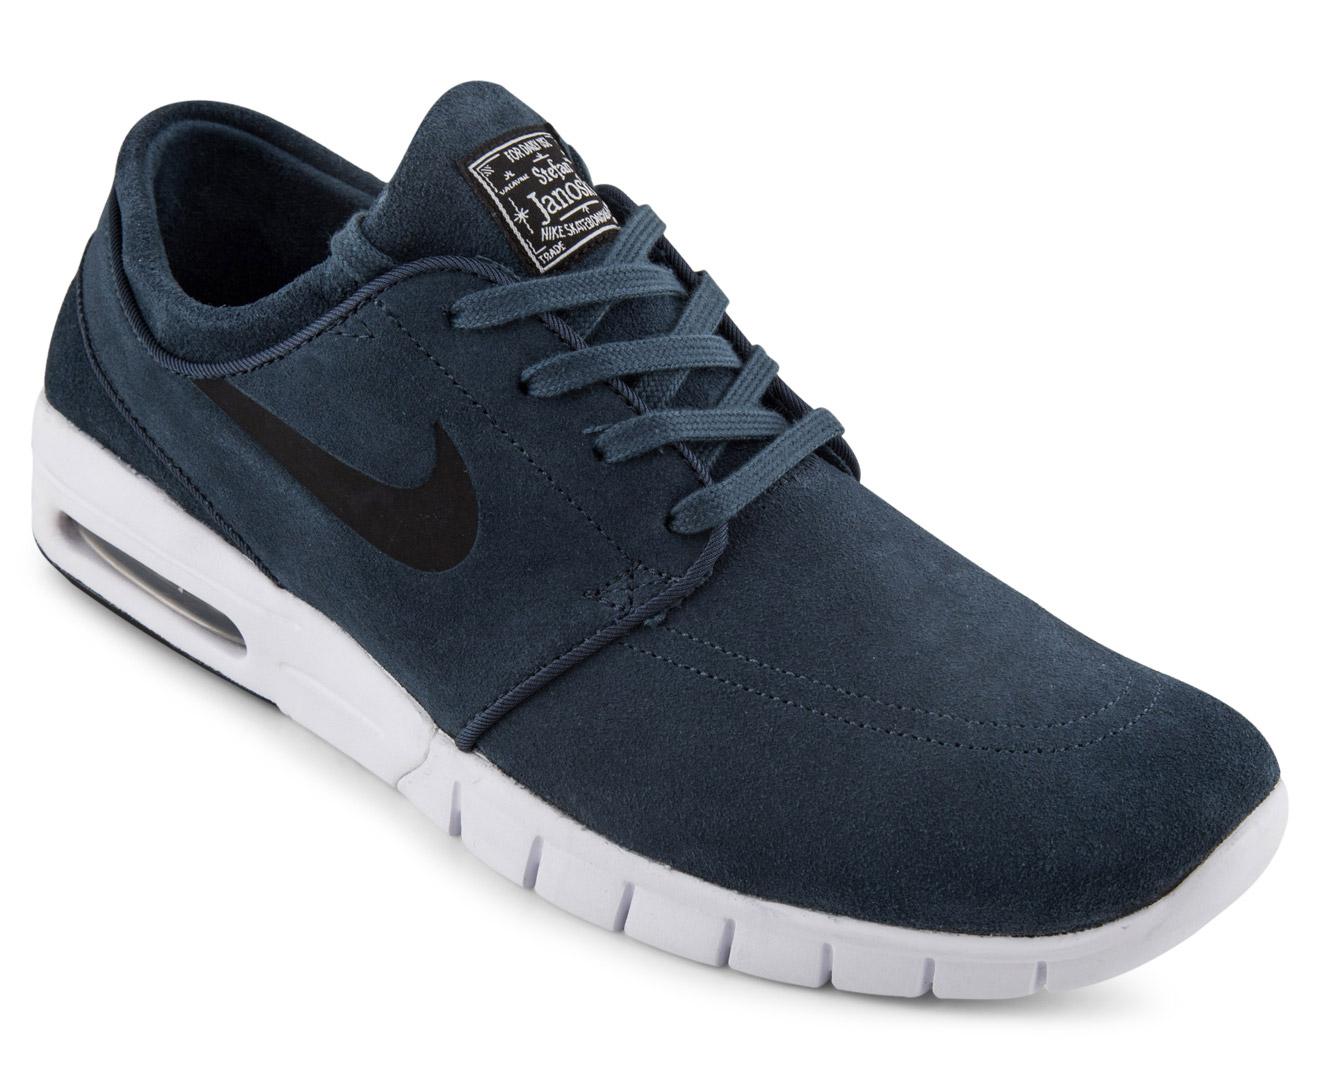 ... Catch.com.au | Nike Men's Stefan Janoski Max L Shoe - Squadron Blue Nike  SB ...